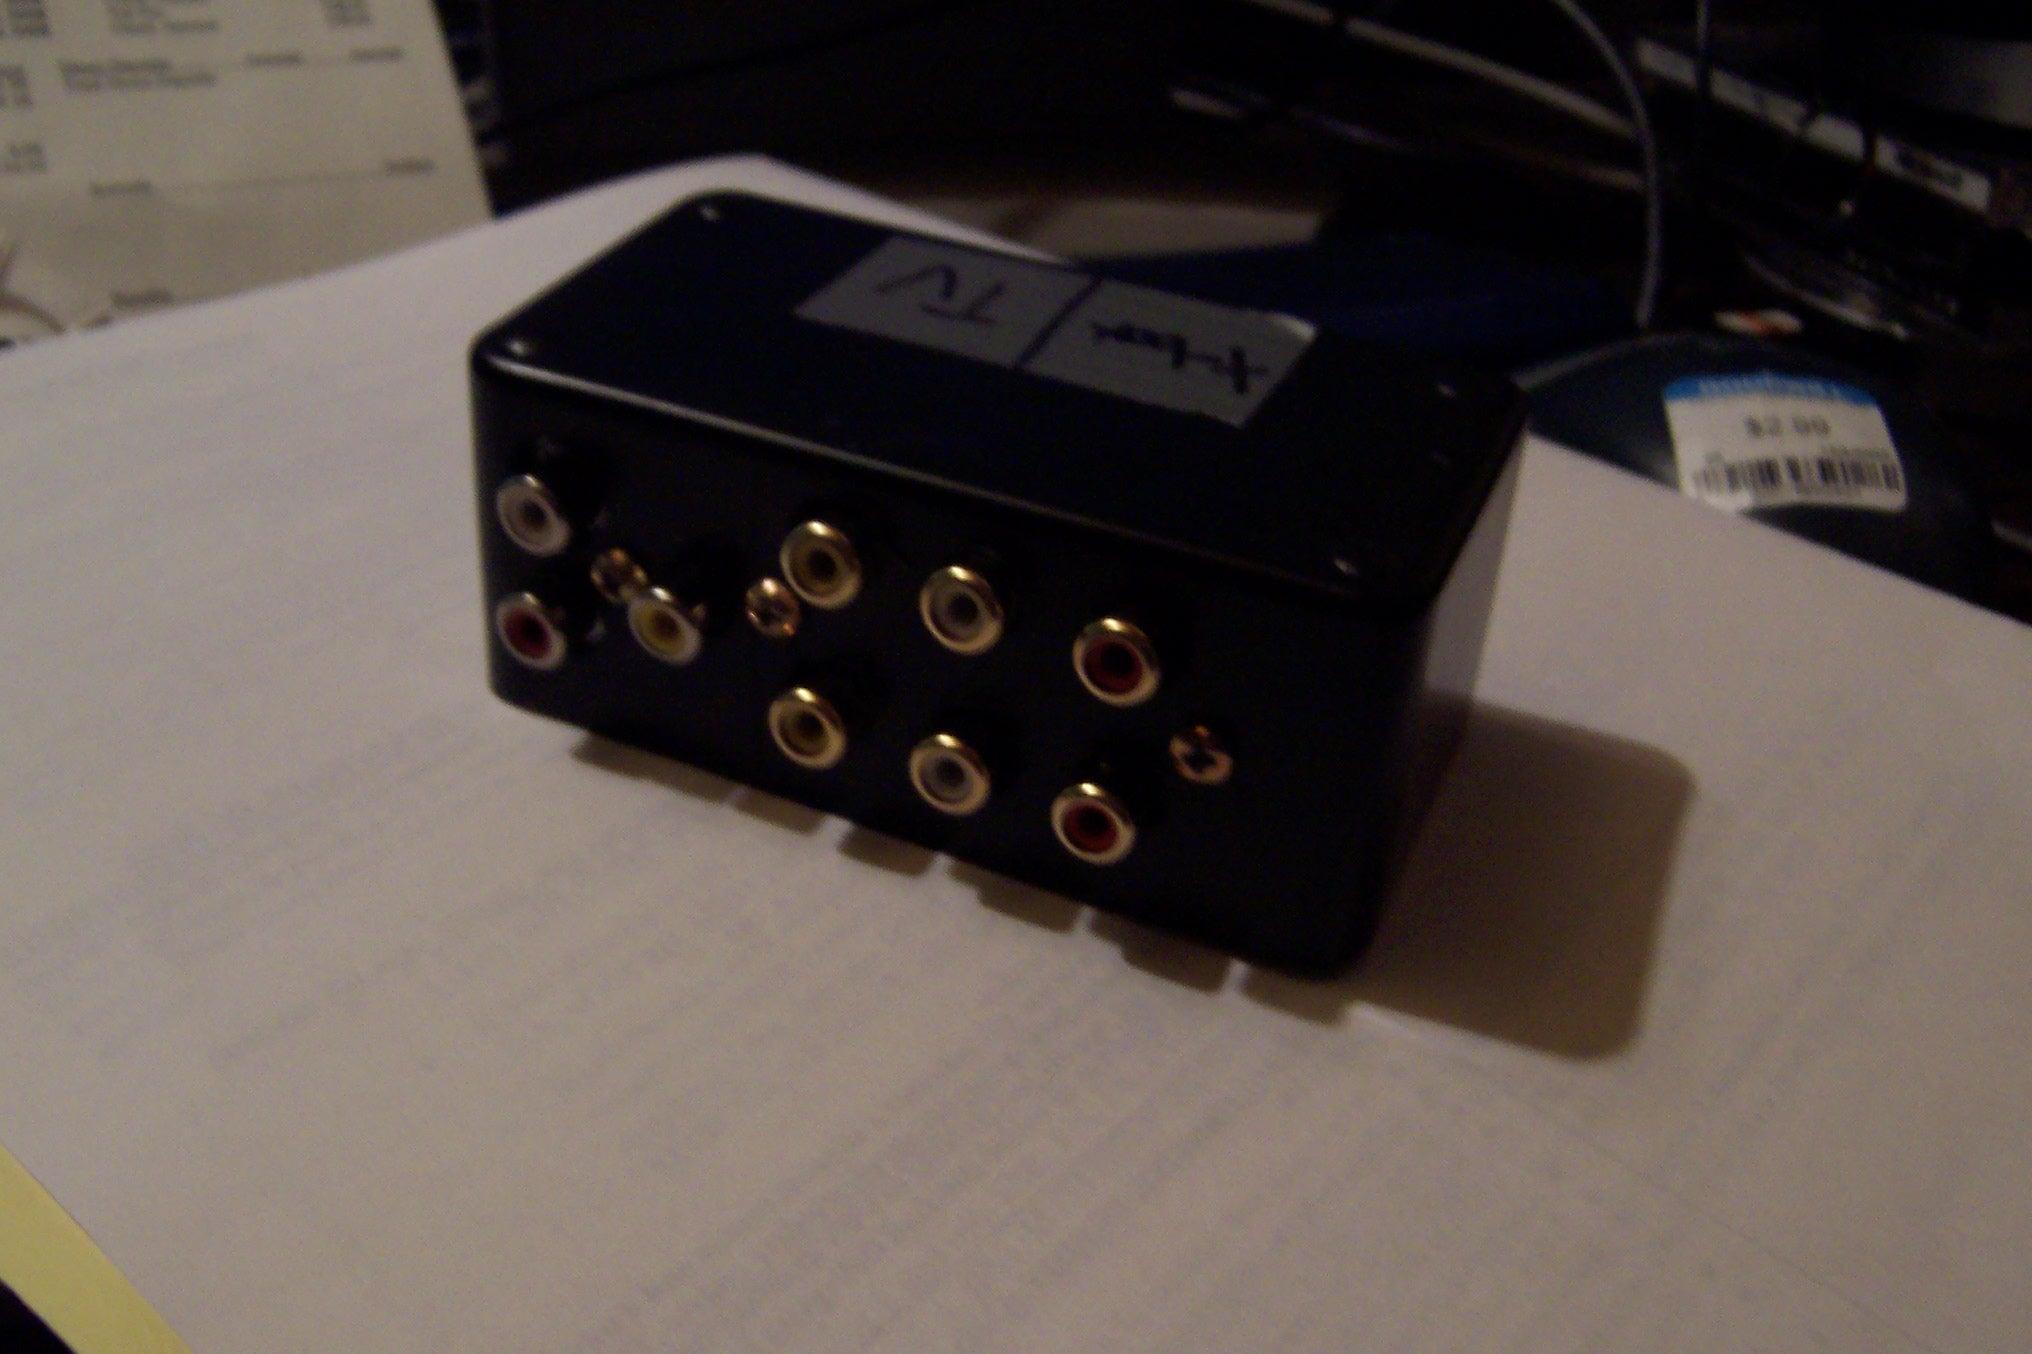 Rca Composit Av Switch 6 Steps 2 Way Box